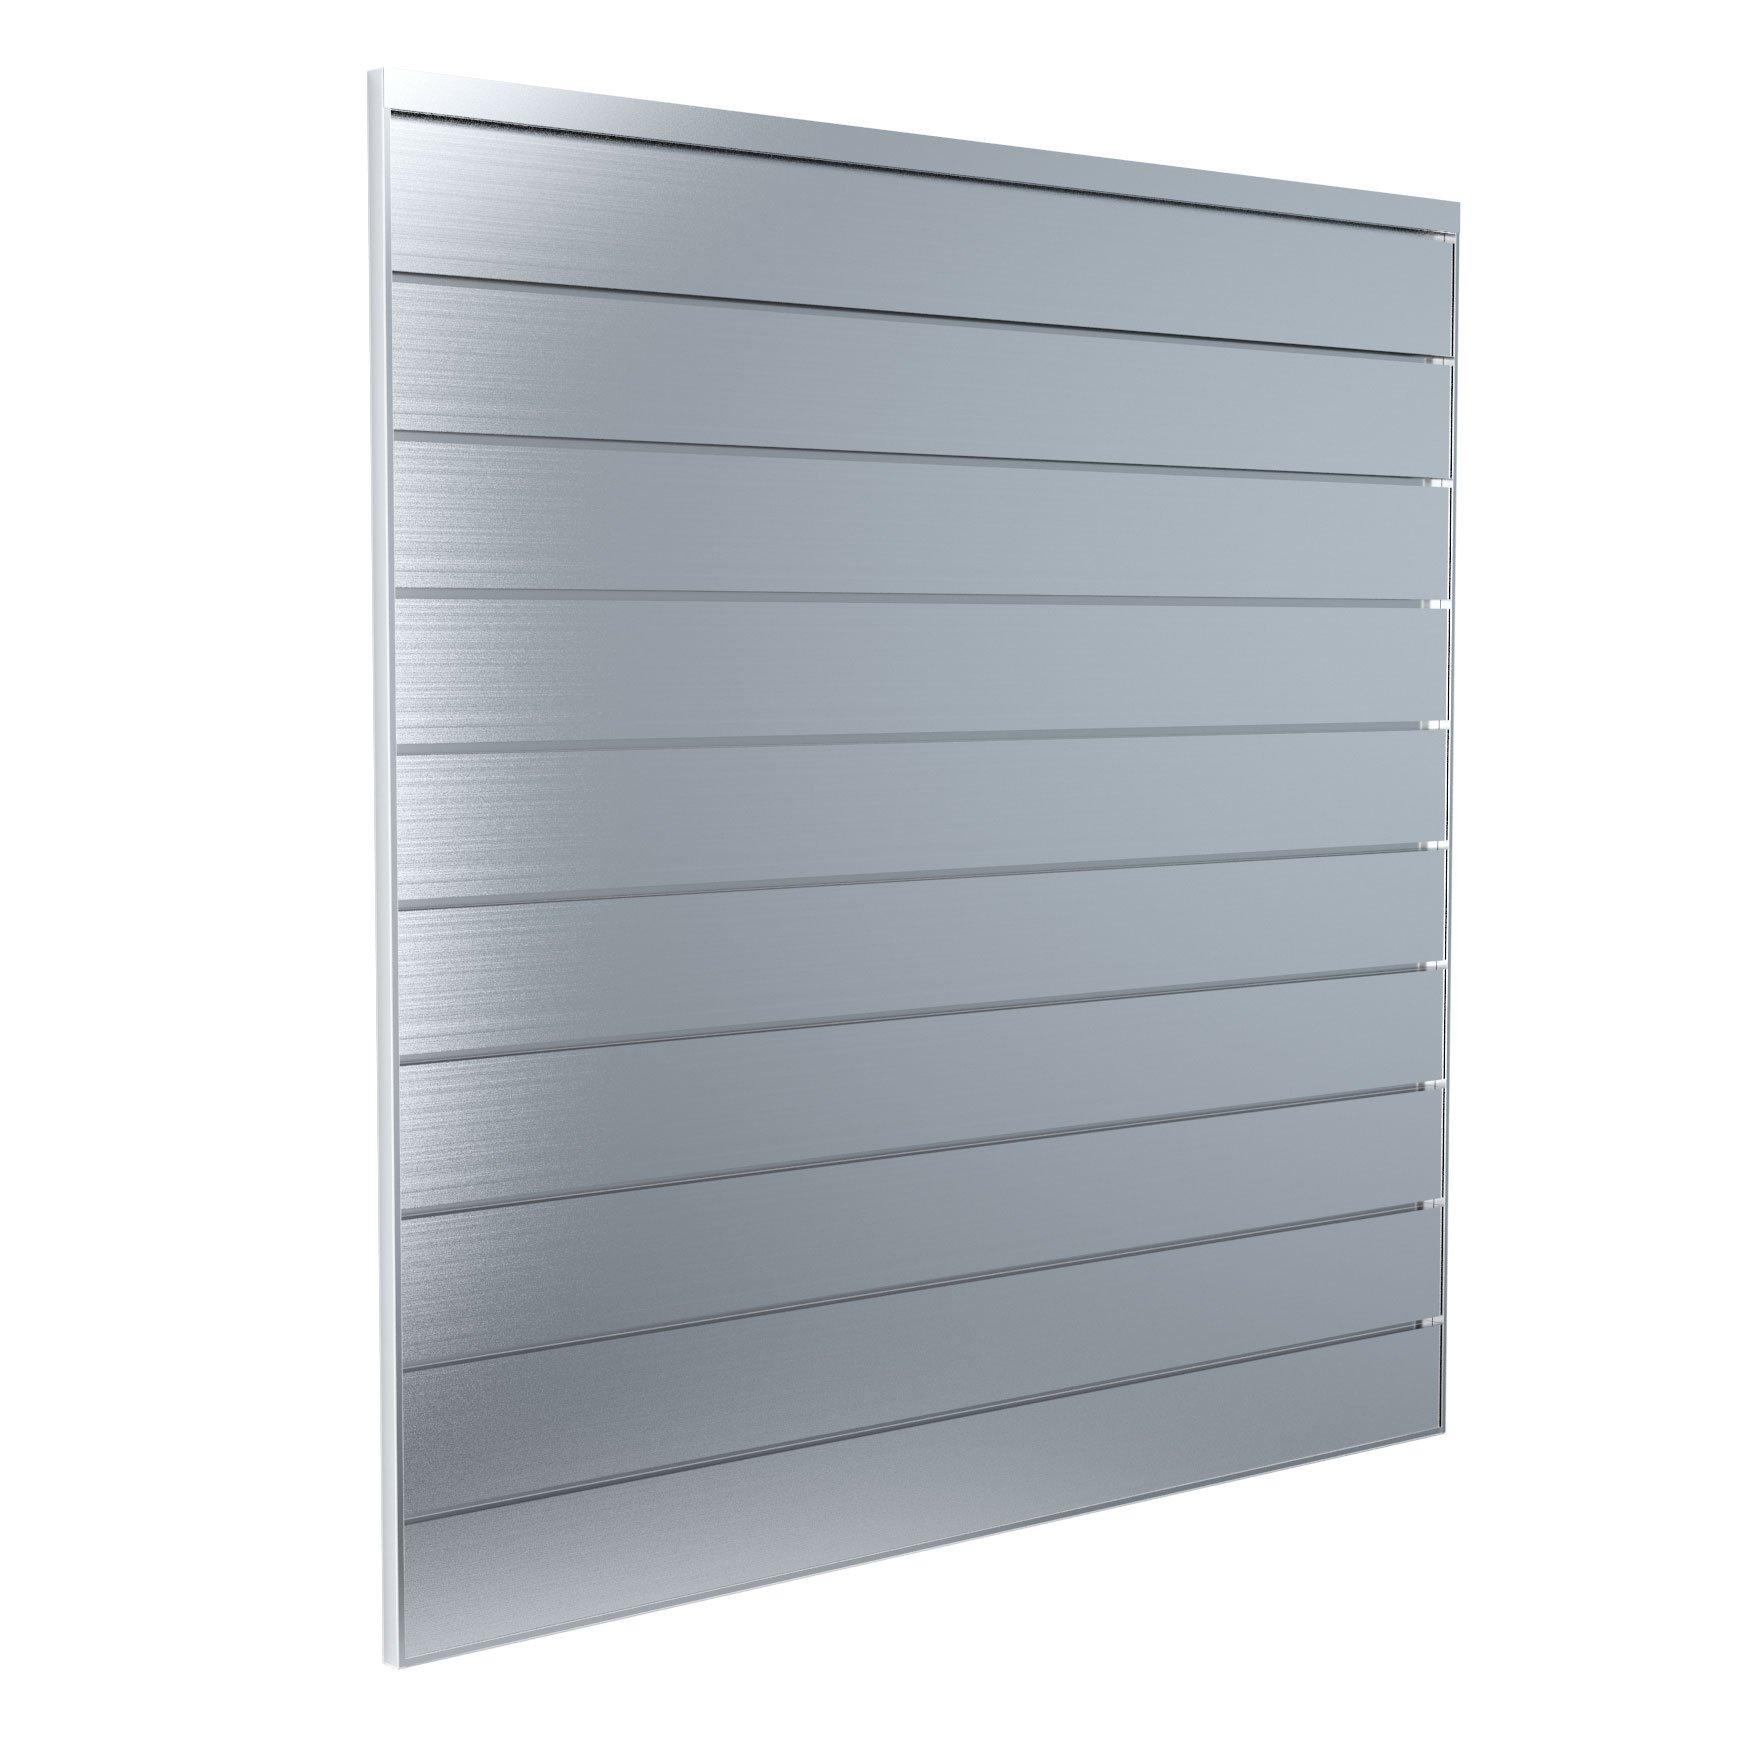 Proslat 88901 Aluminum Slatwall Garage Organize Storage System with 5 Steel Hooks, 4 x 4', Silver